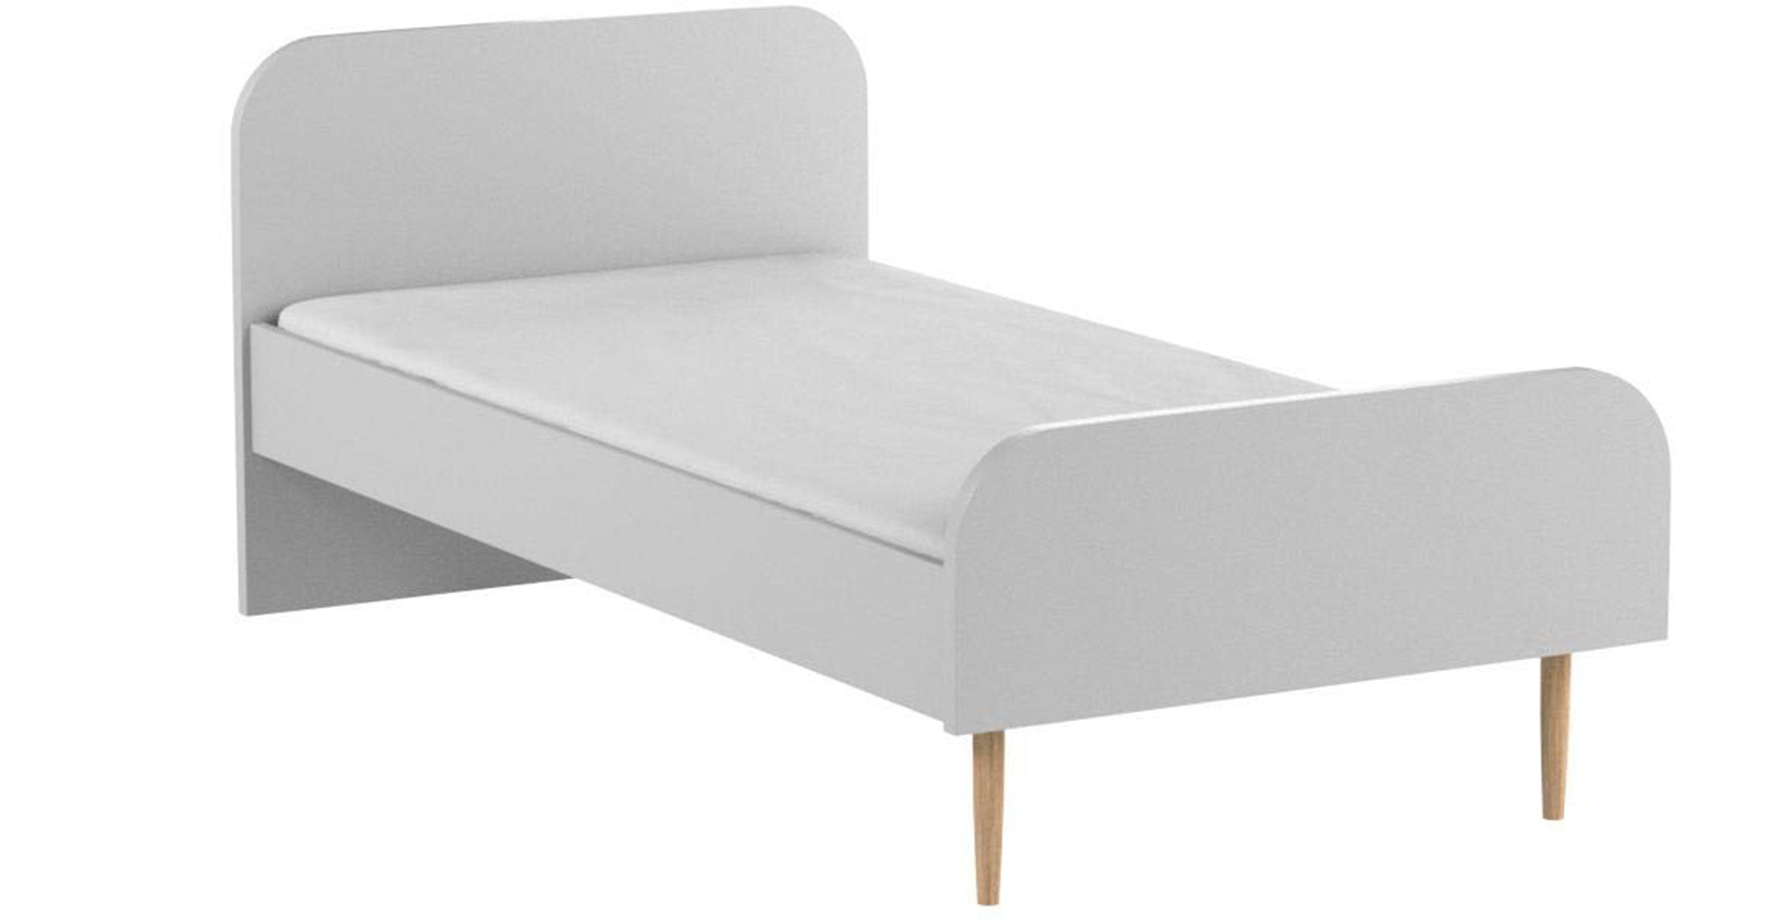 Base para cama individual de melamina gris de Movian